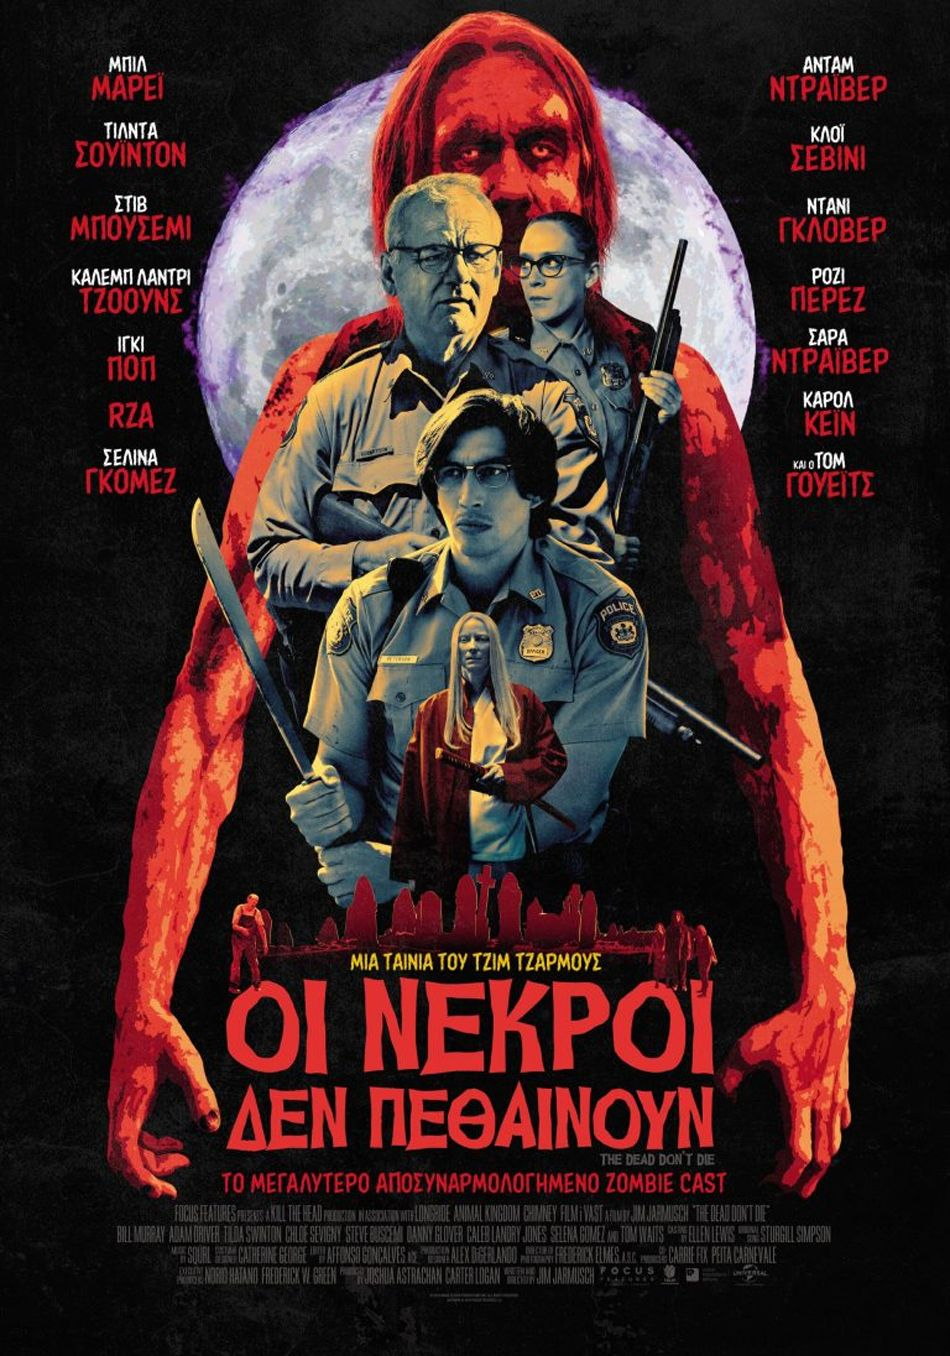 The Dead Don't Die (Οι Νεκροί Δεν Πεθαίνουν) Poster Πόστερ